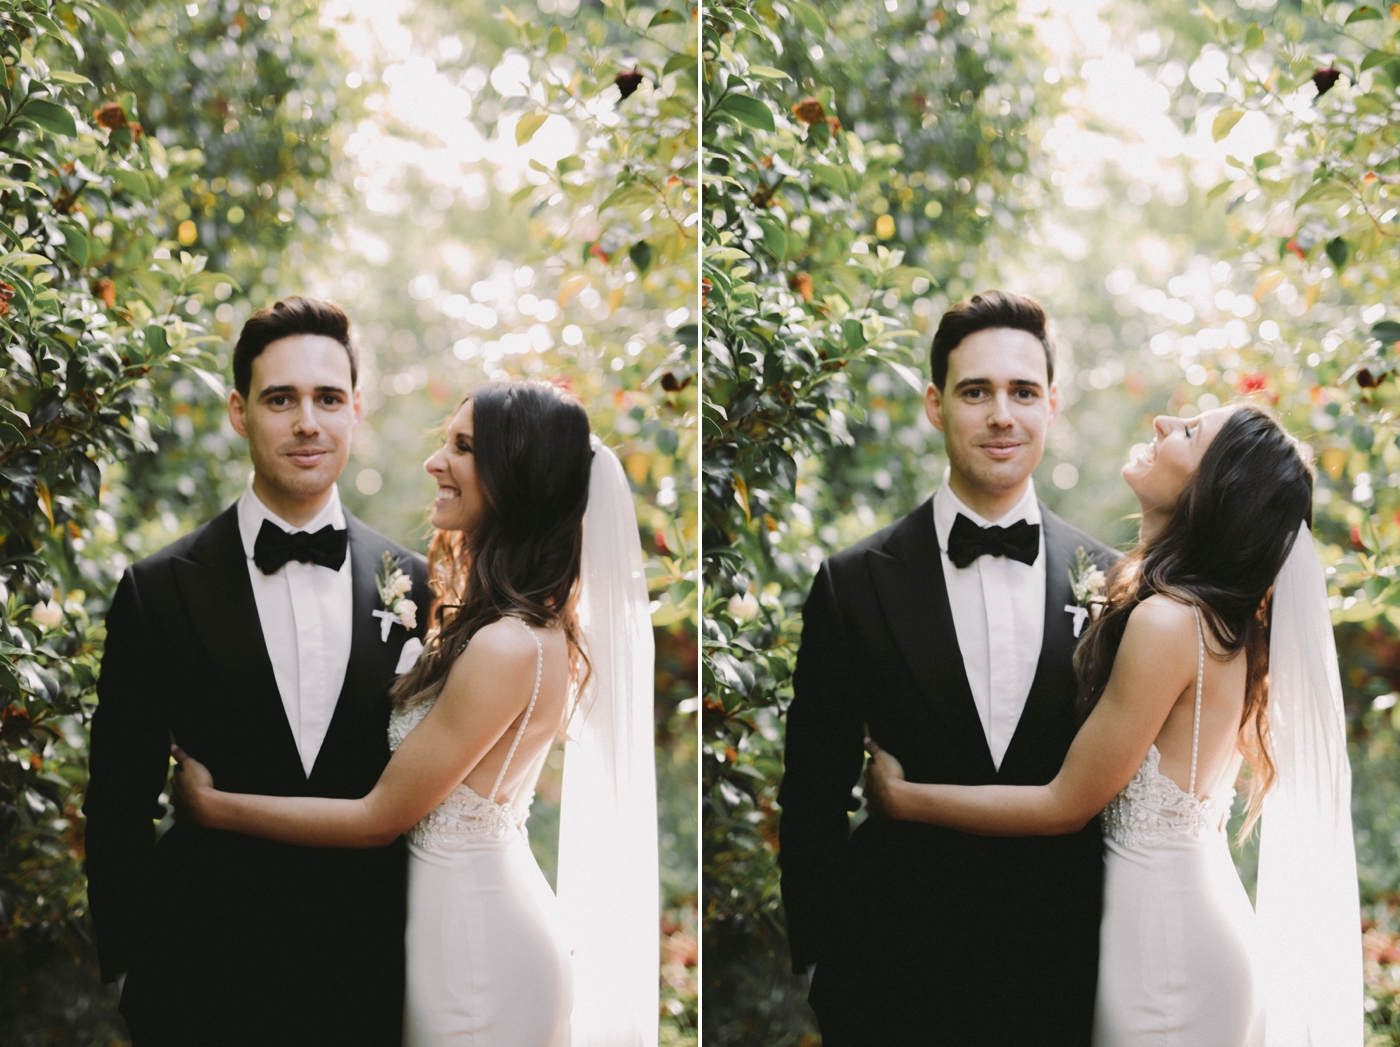 Katie and Ben - Natural Wedding Photography in Adelaide - Beautiful, Candid Wedding Photographer - Adelaide Hills Wedding - Katherine Schultz - www.katherineschultzphotography.com_0052.jpg